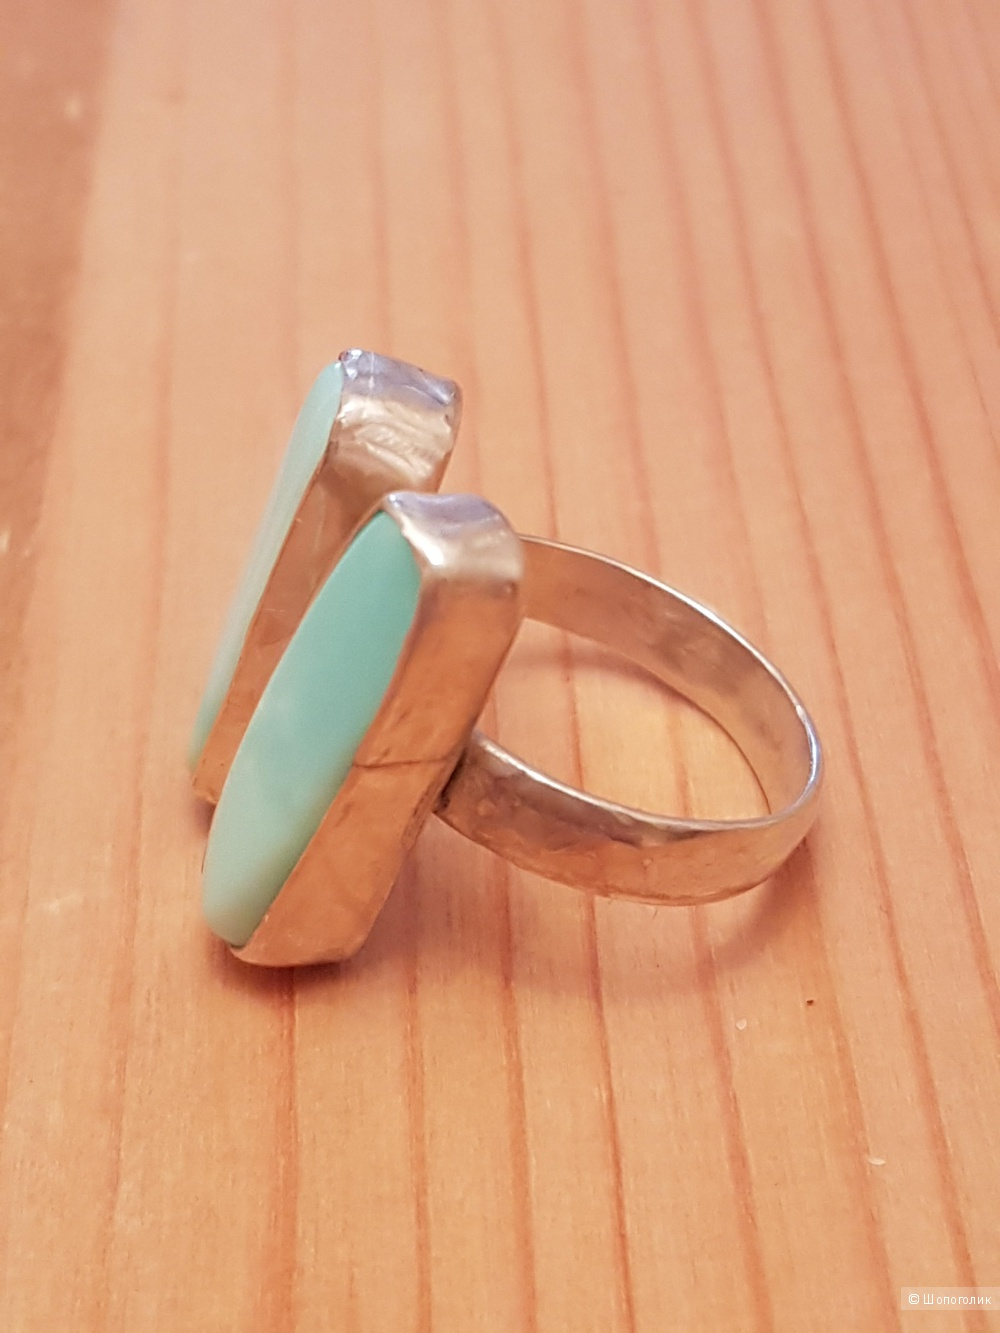 Кольцо с перуанским опалом.